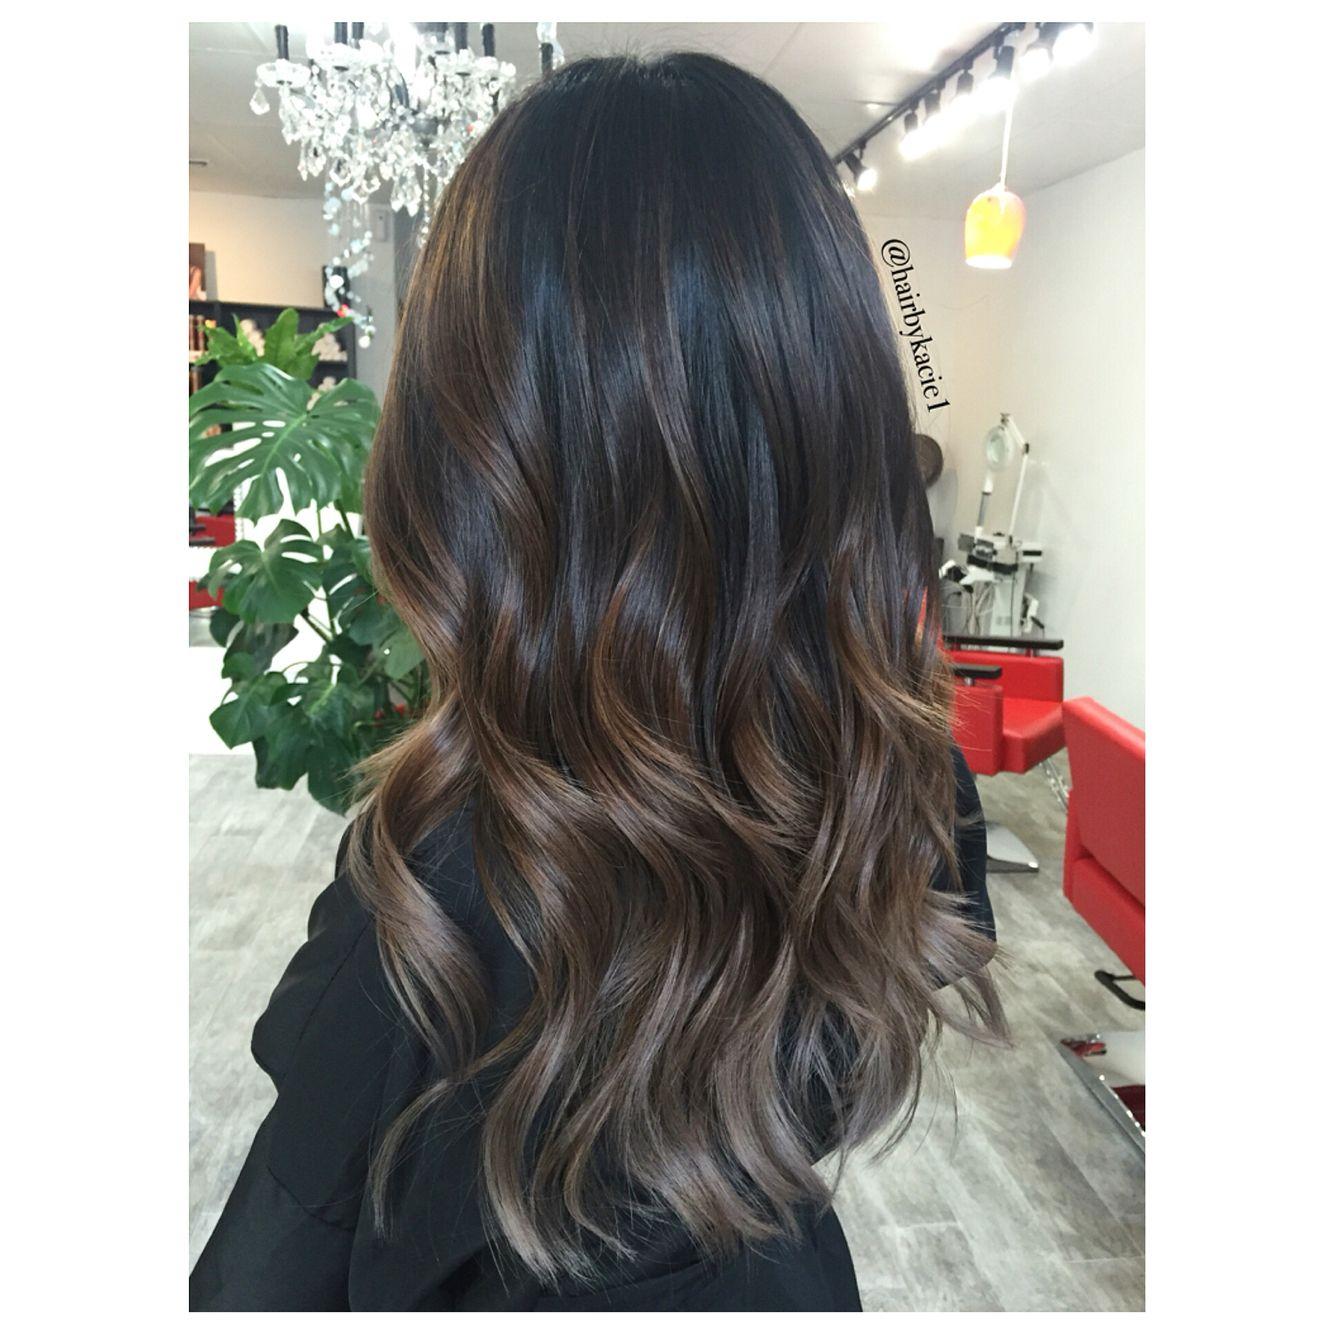 Ash Brown Hair Color Brown Hair Balayage Balayage Hair